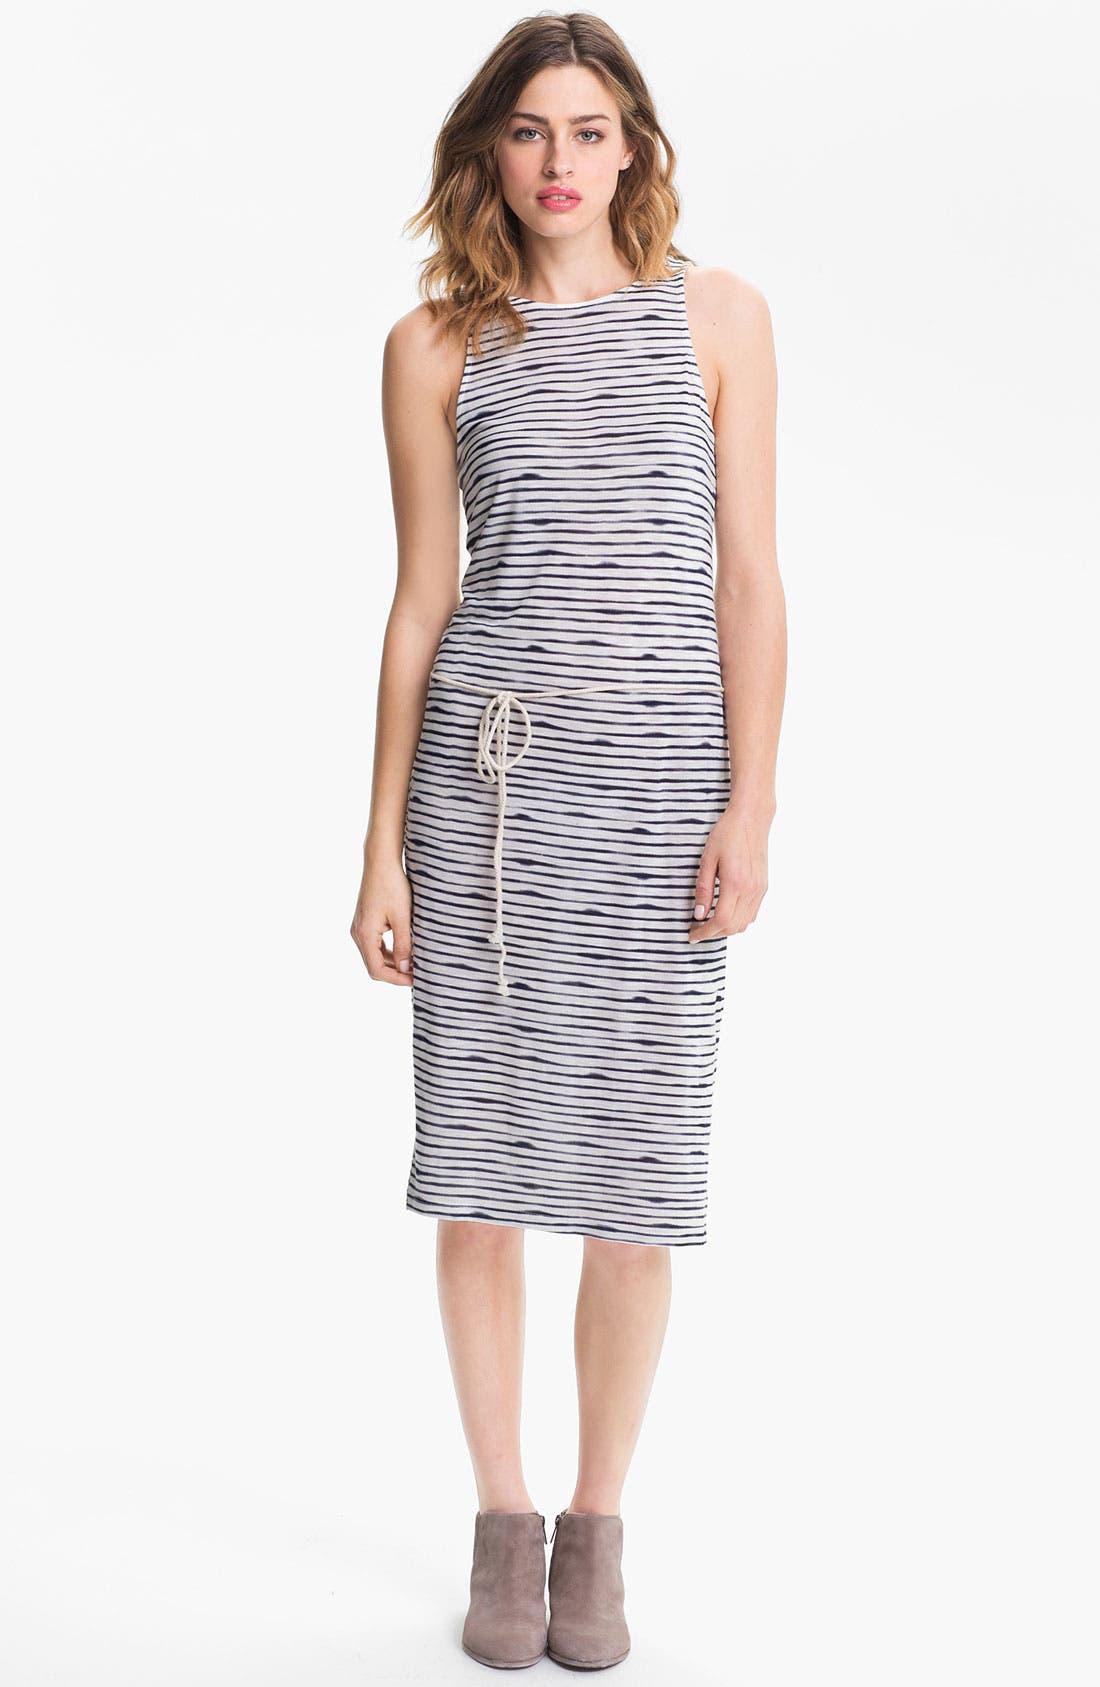 Alternate Image 1 Selected - Soft Joie 'Mimi' Slub Stripe Midi Tank Dress